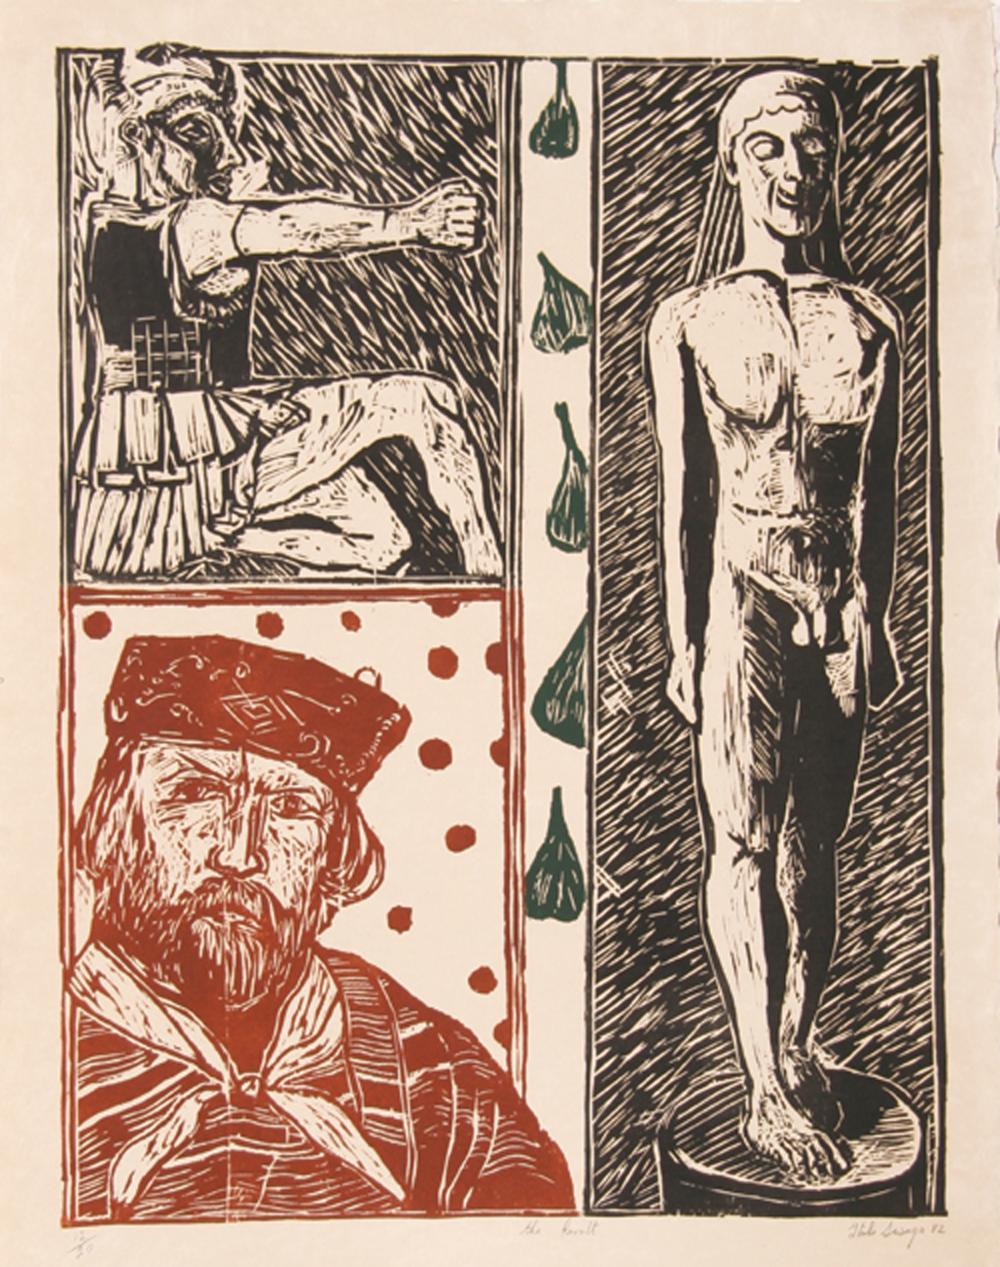 Italo Scanga, The Revolt, Woodcut